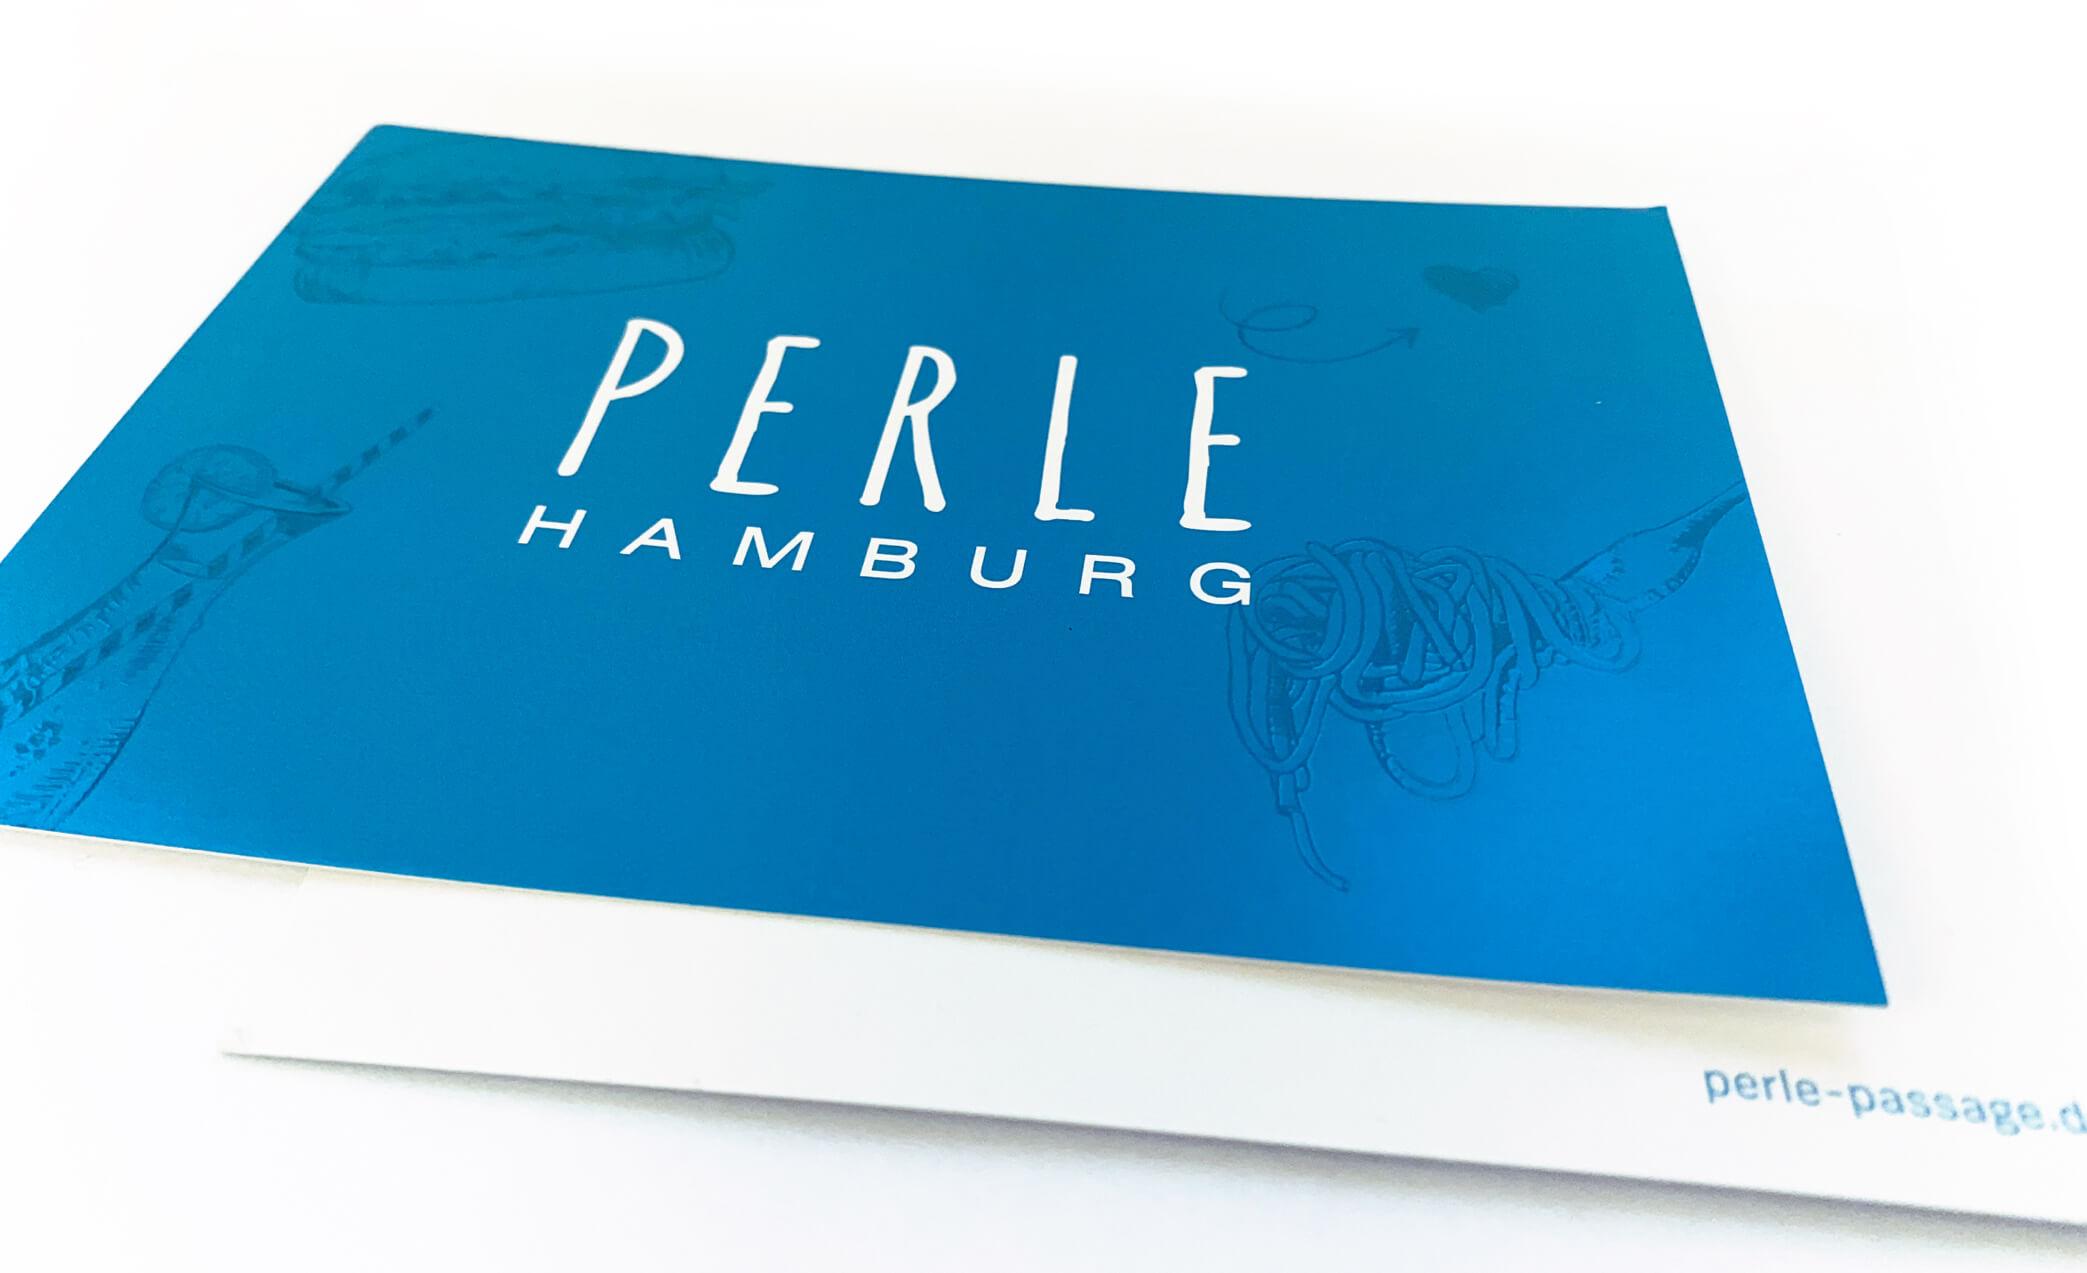 PERLE Hamburg Postkarte